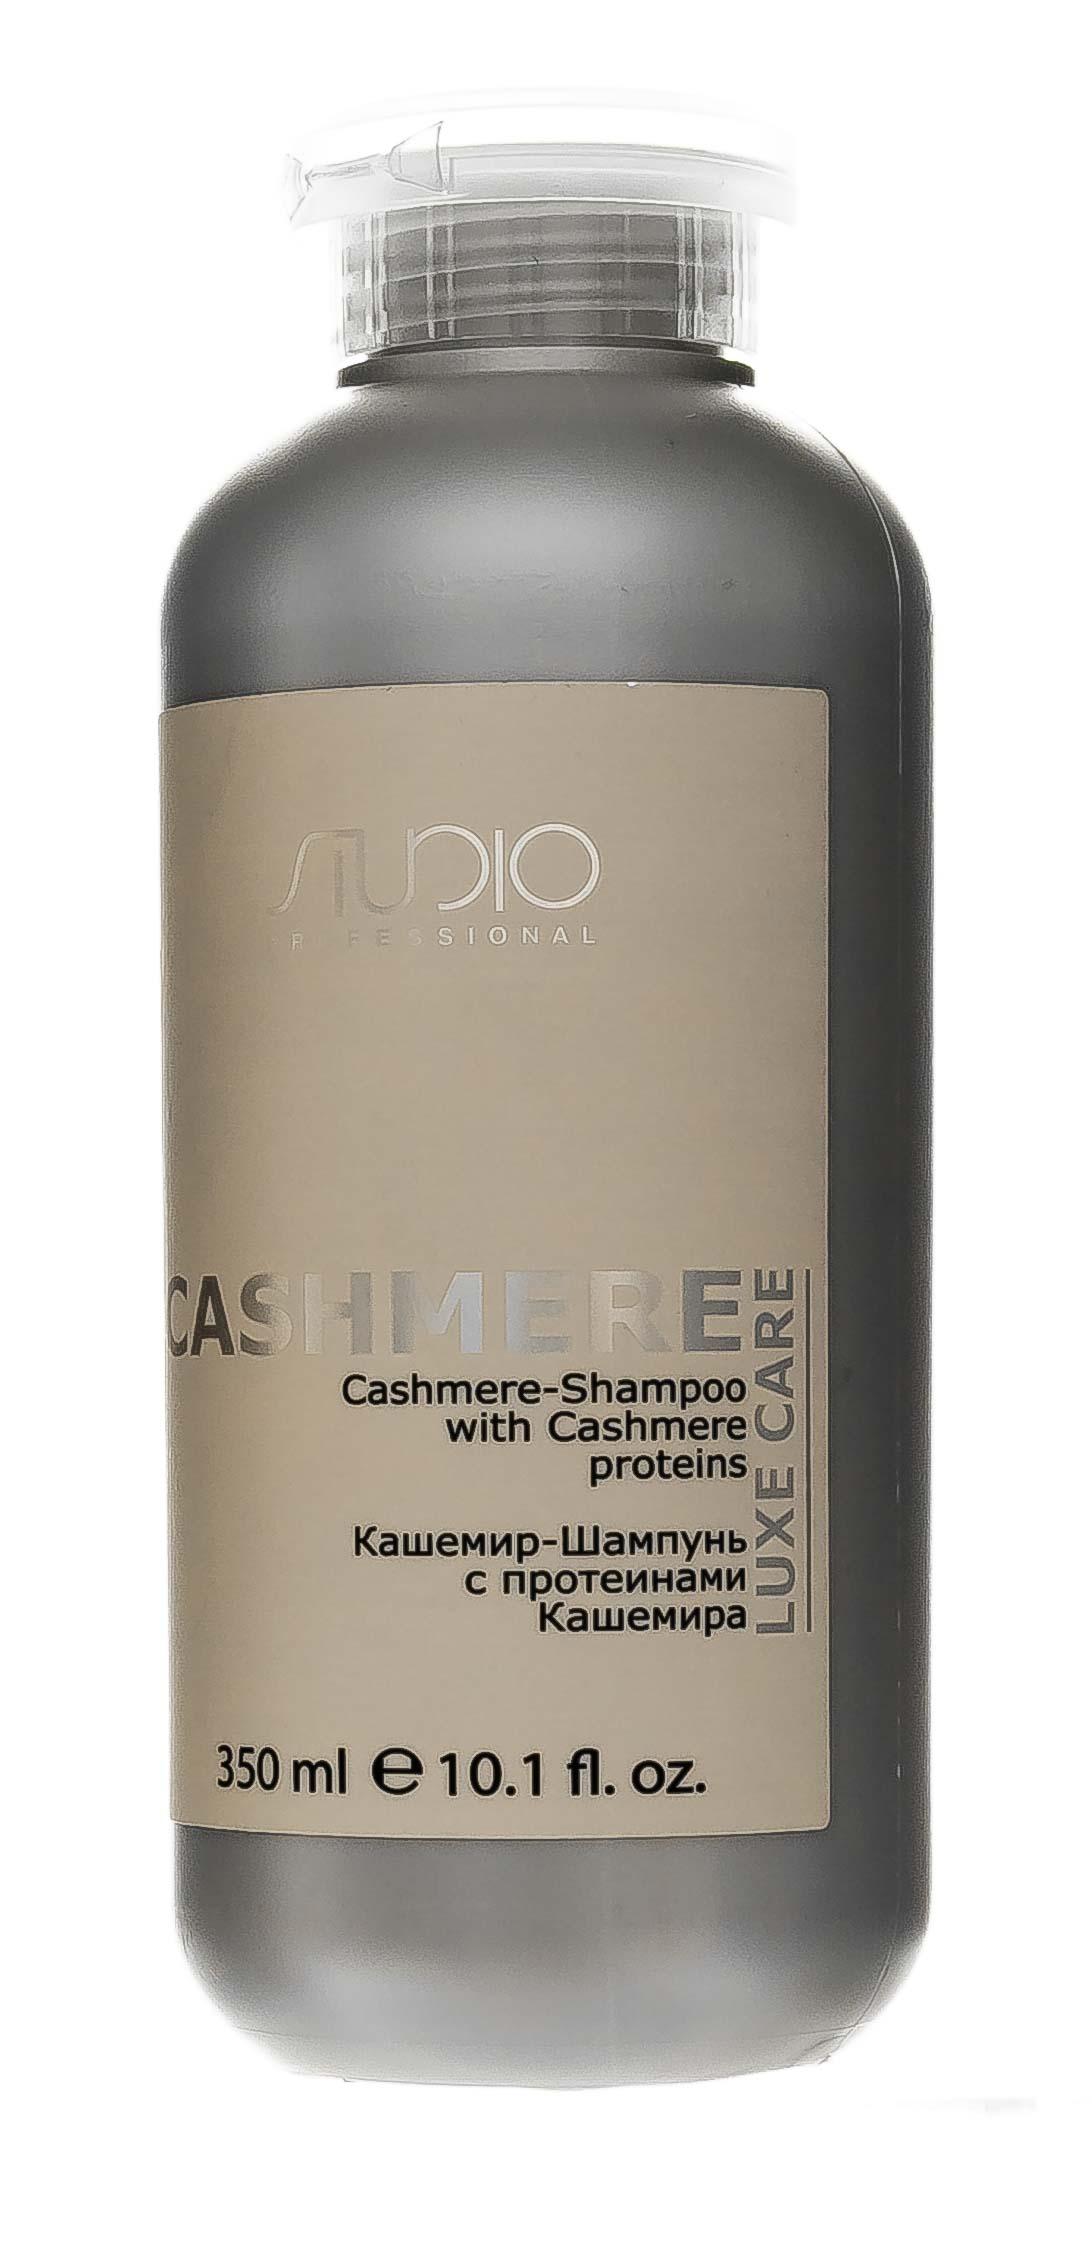 Kapous Professional Кашемир-Бальзам с протеинами кашемира серии Luxe Care 350 мл (Kapous Professional, )  - Купить